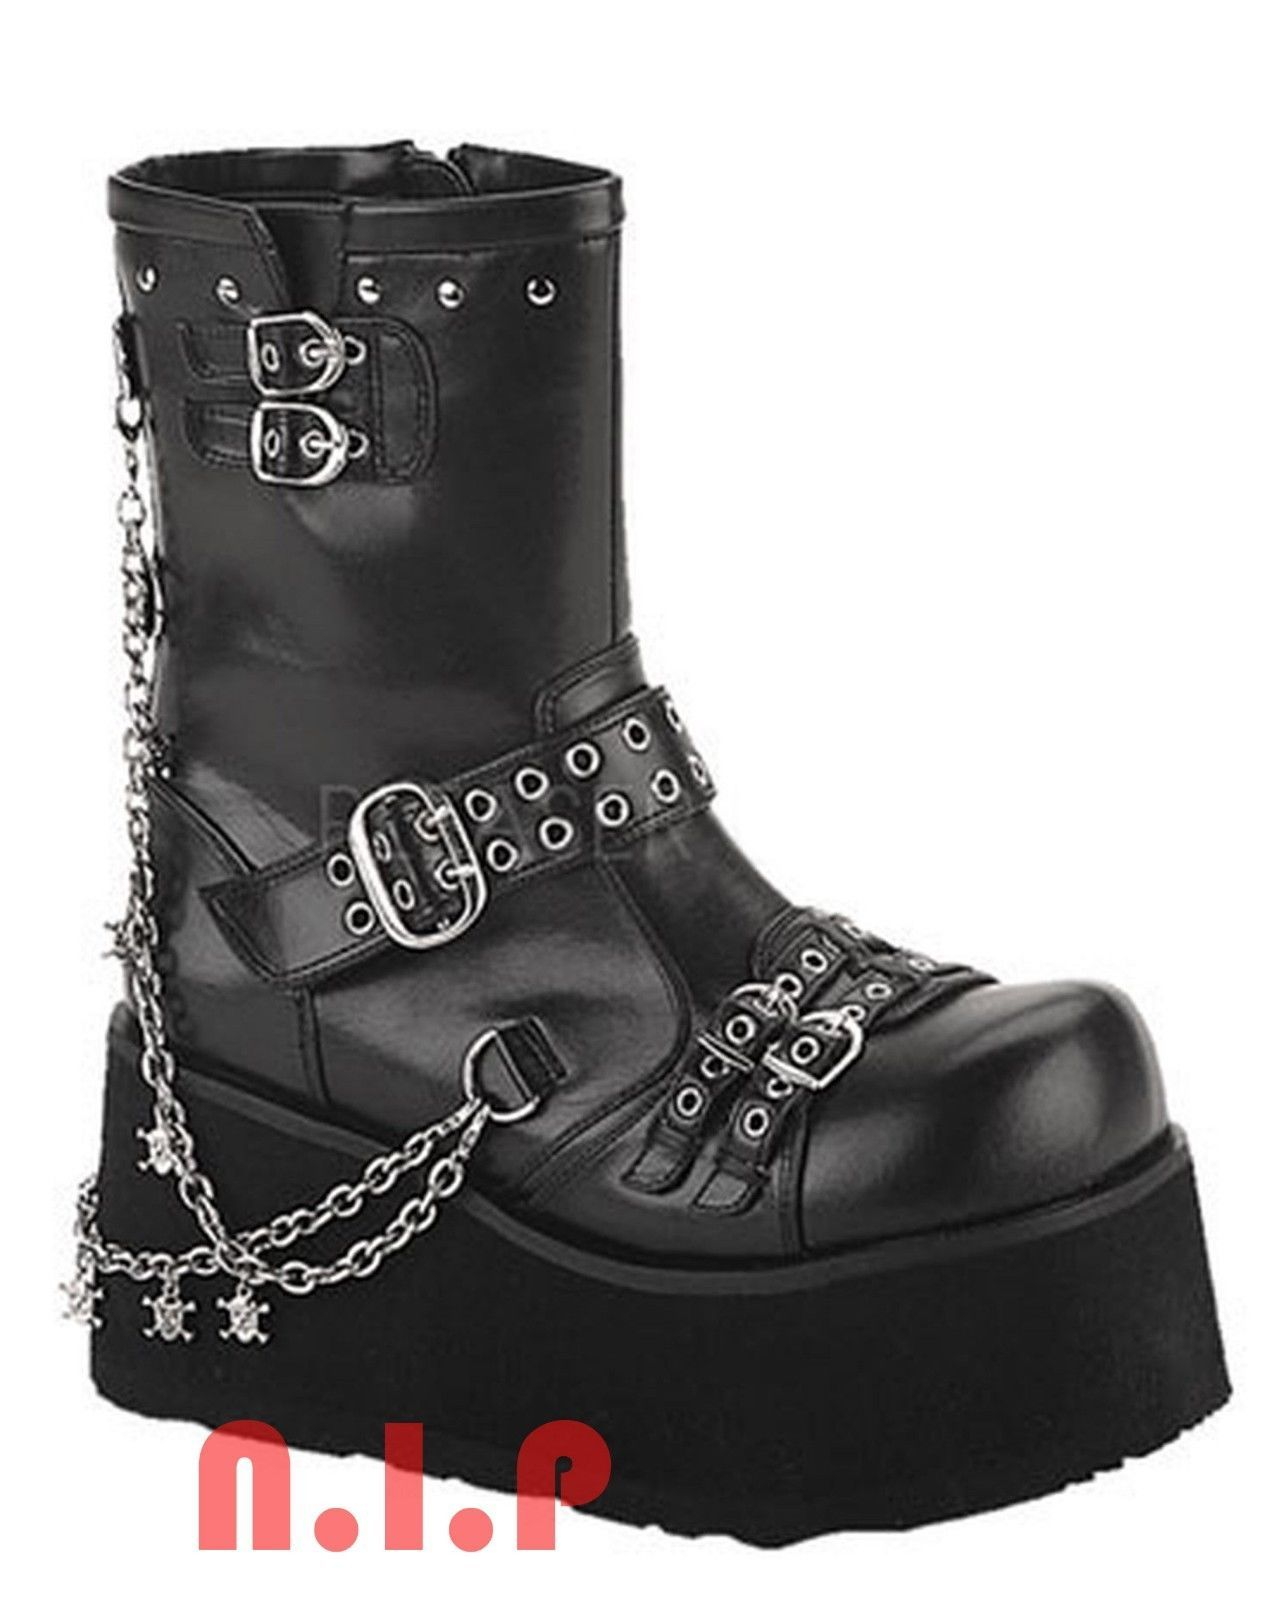 56d334bf9233 Demonia Skull Platform Heavy Metal Punk Goth and 50 similar items. 57